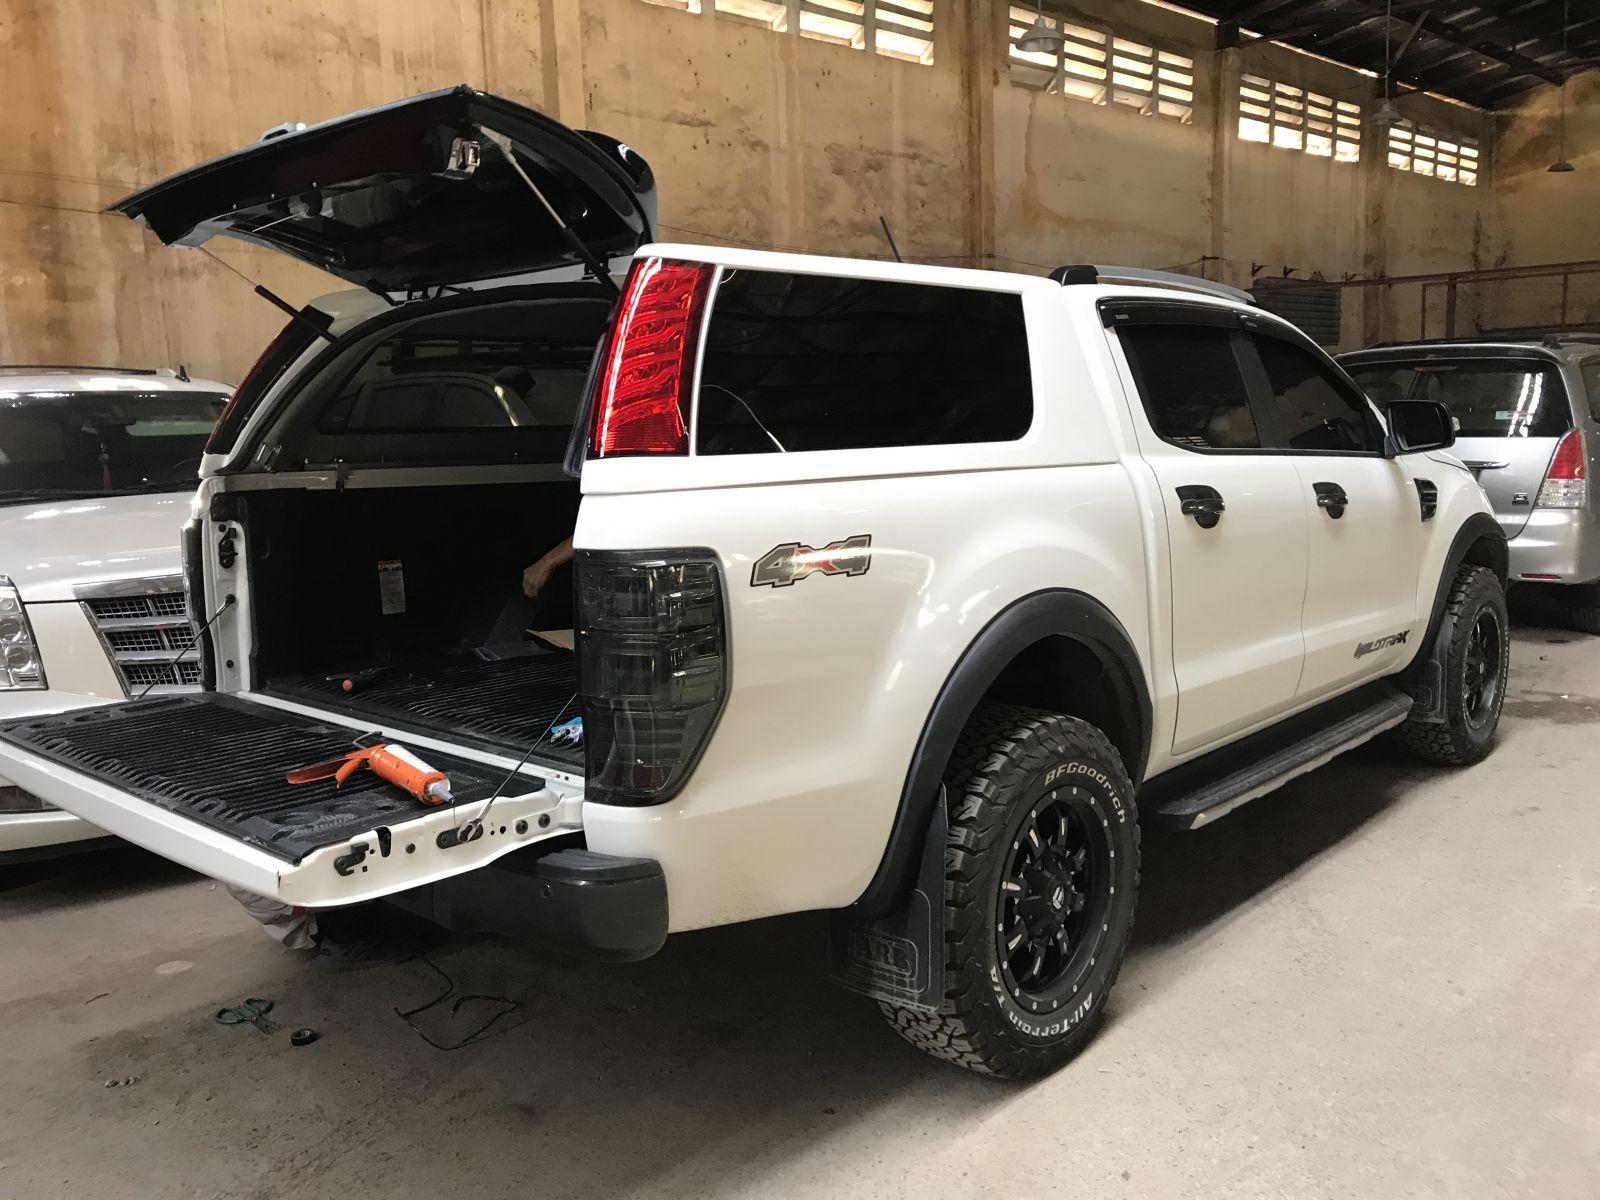 nap thung Ford Ranger cao